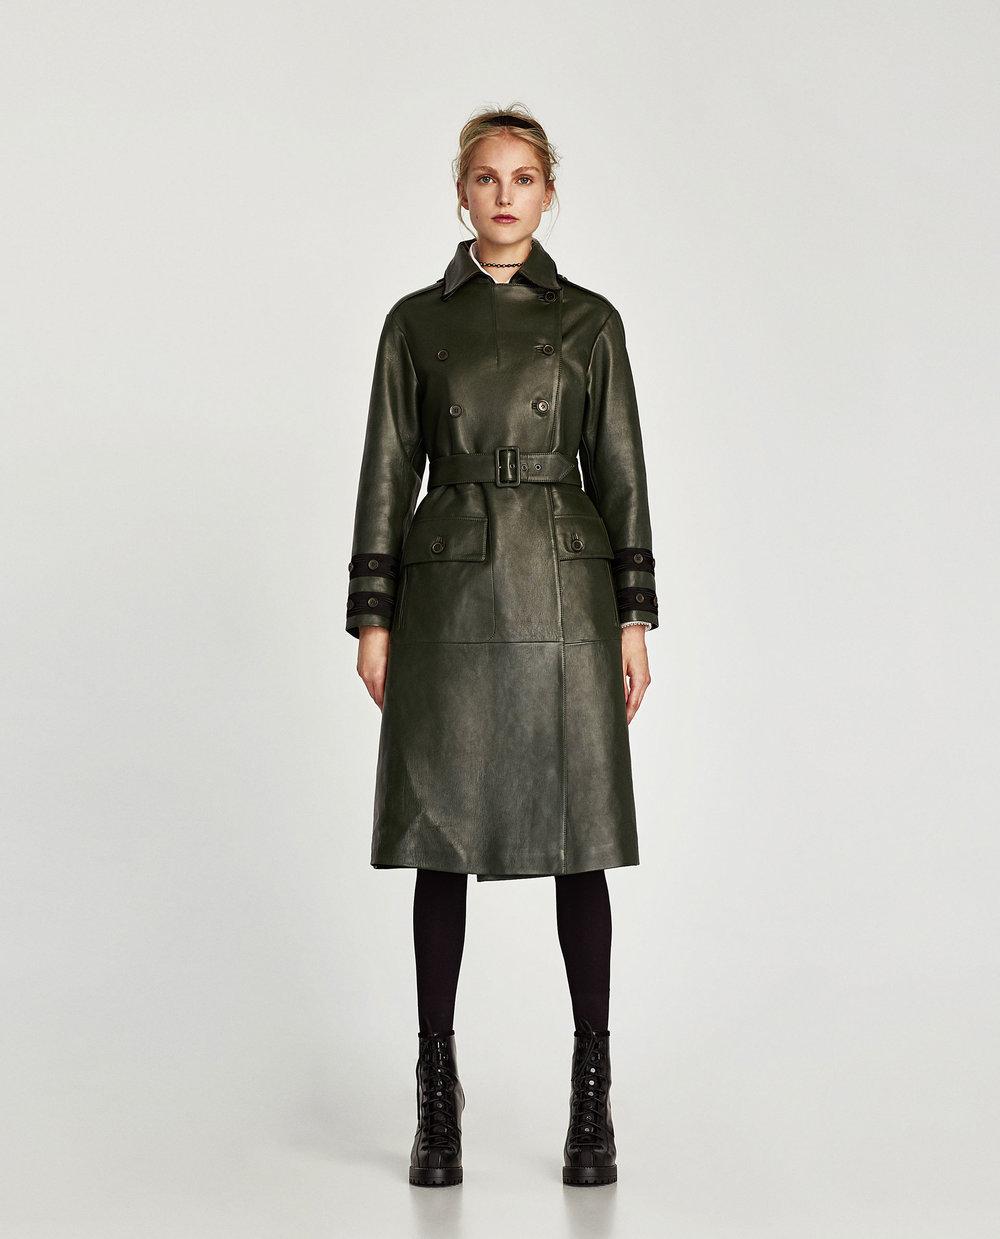 LEATHER TRENCH COAT. Zara. $479.